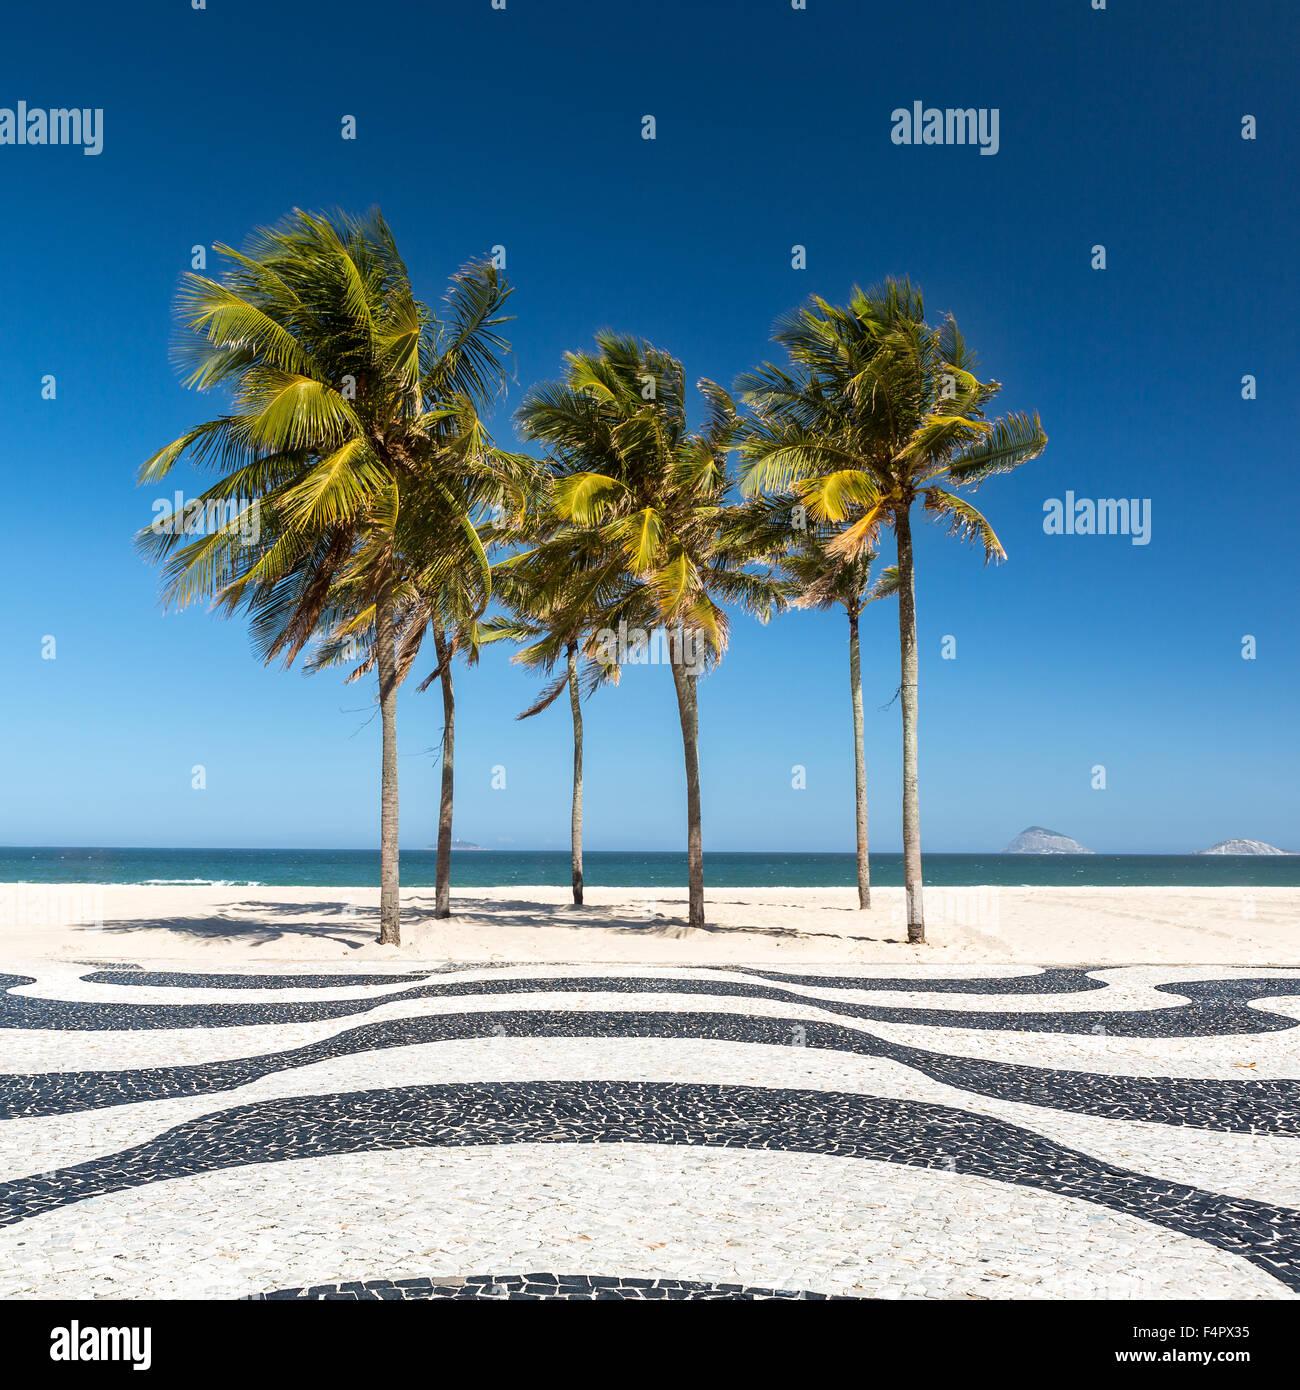 Palm trees and the iconic Copacabana beach mosaic sidewalk, in Rio de Janeiro, Brazil. Stock Photo